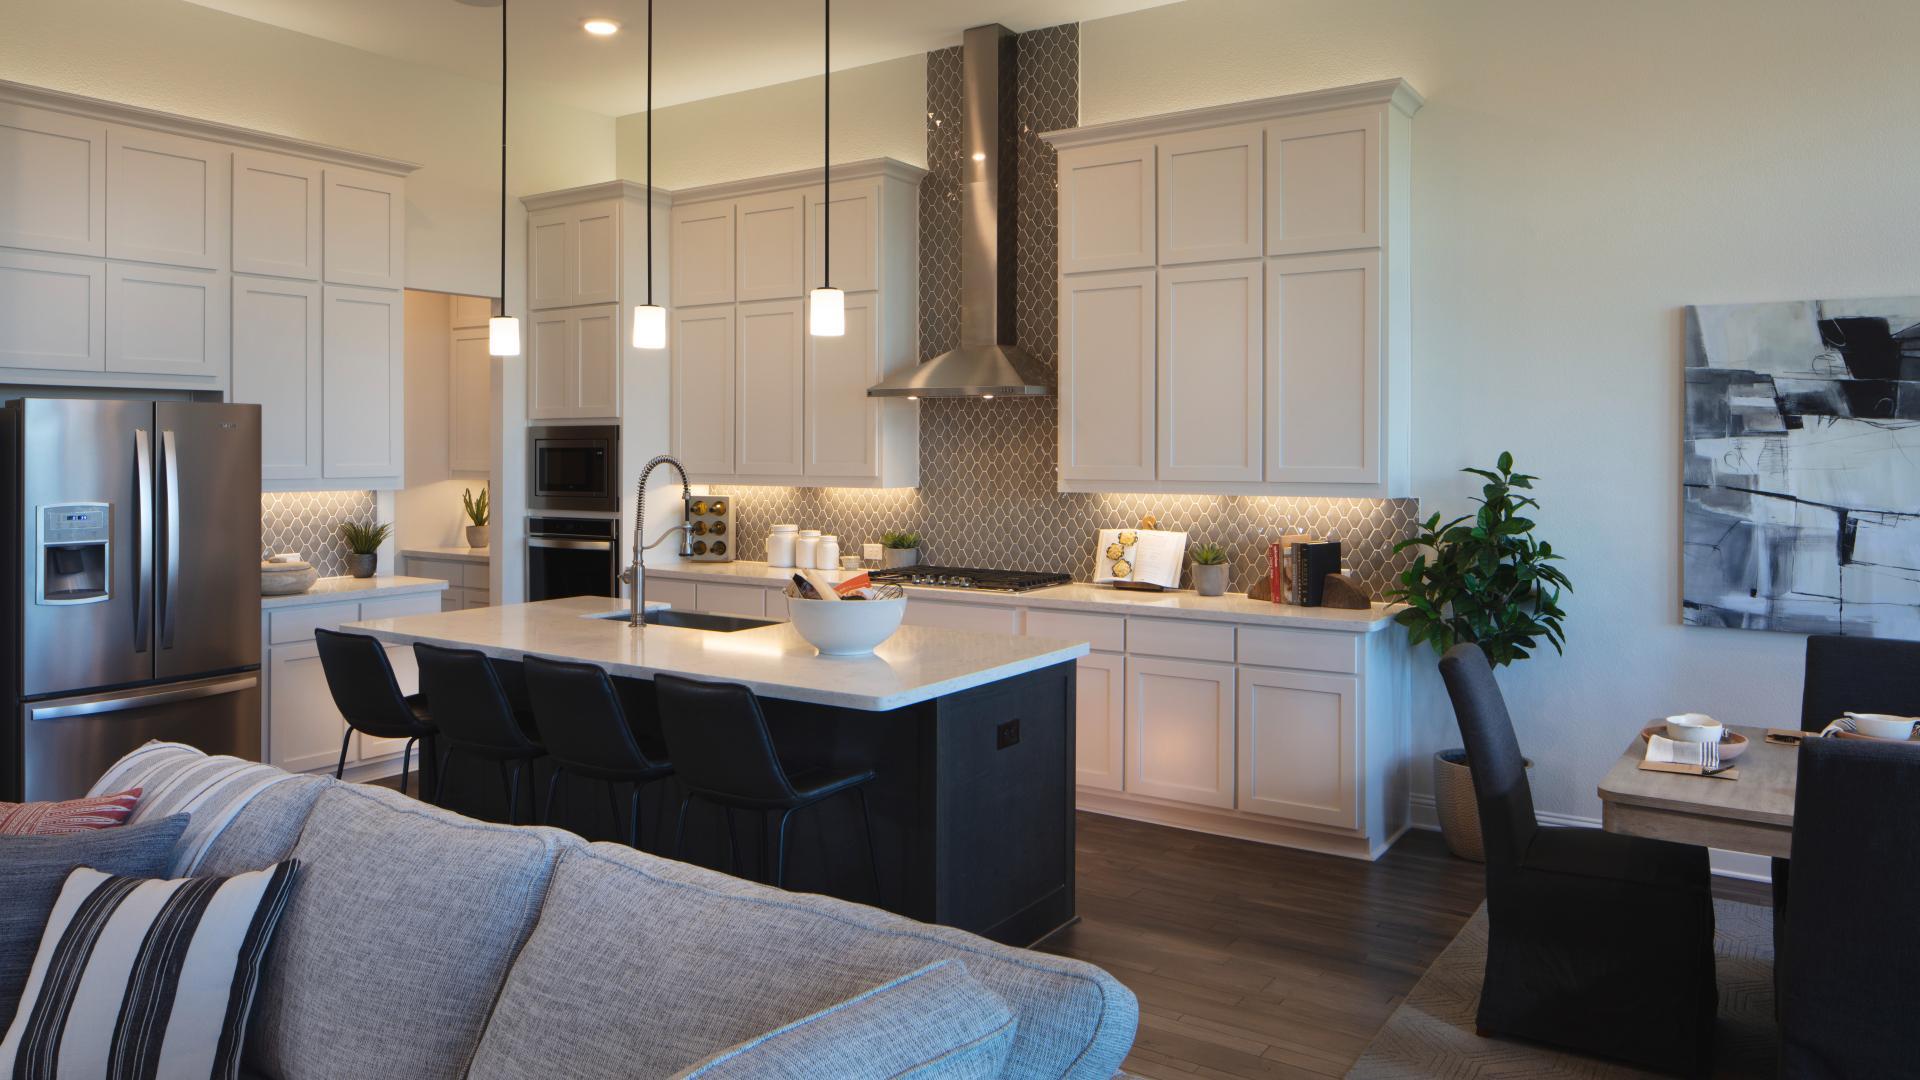 Open home designs